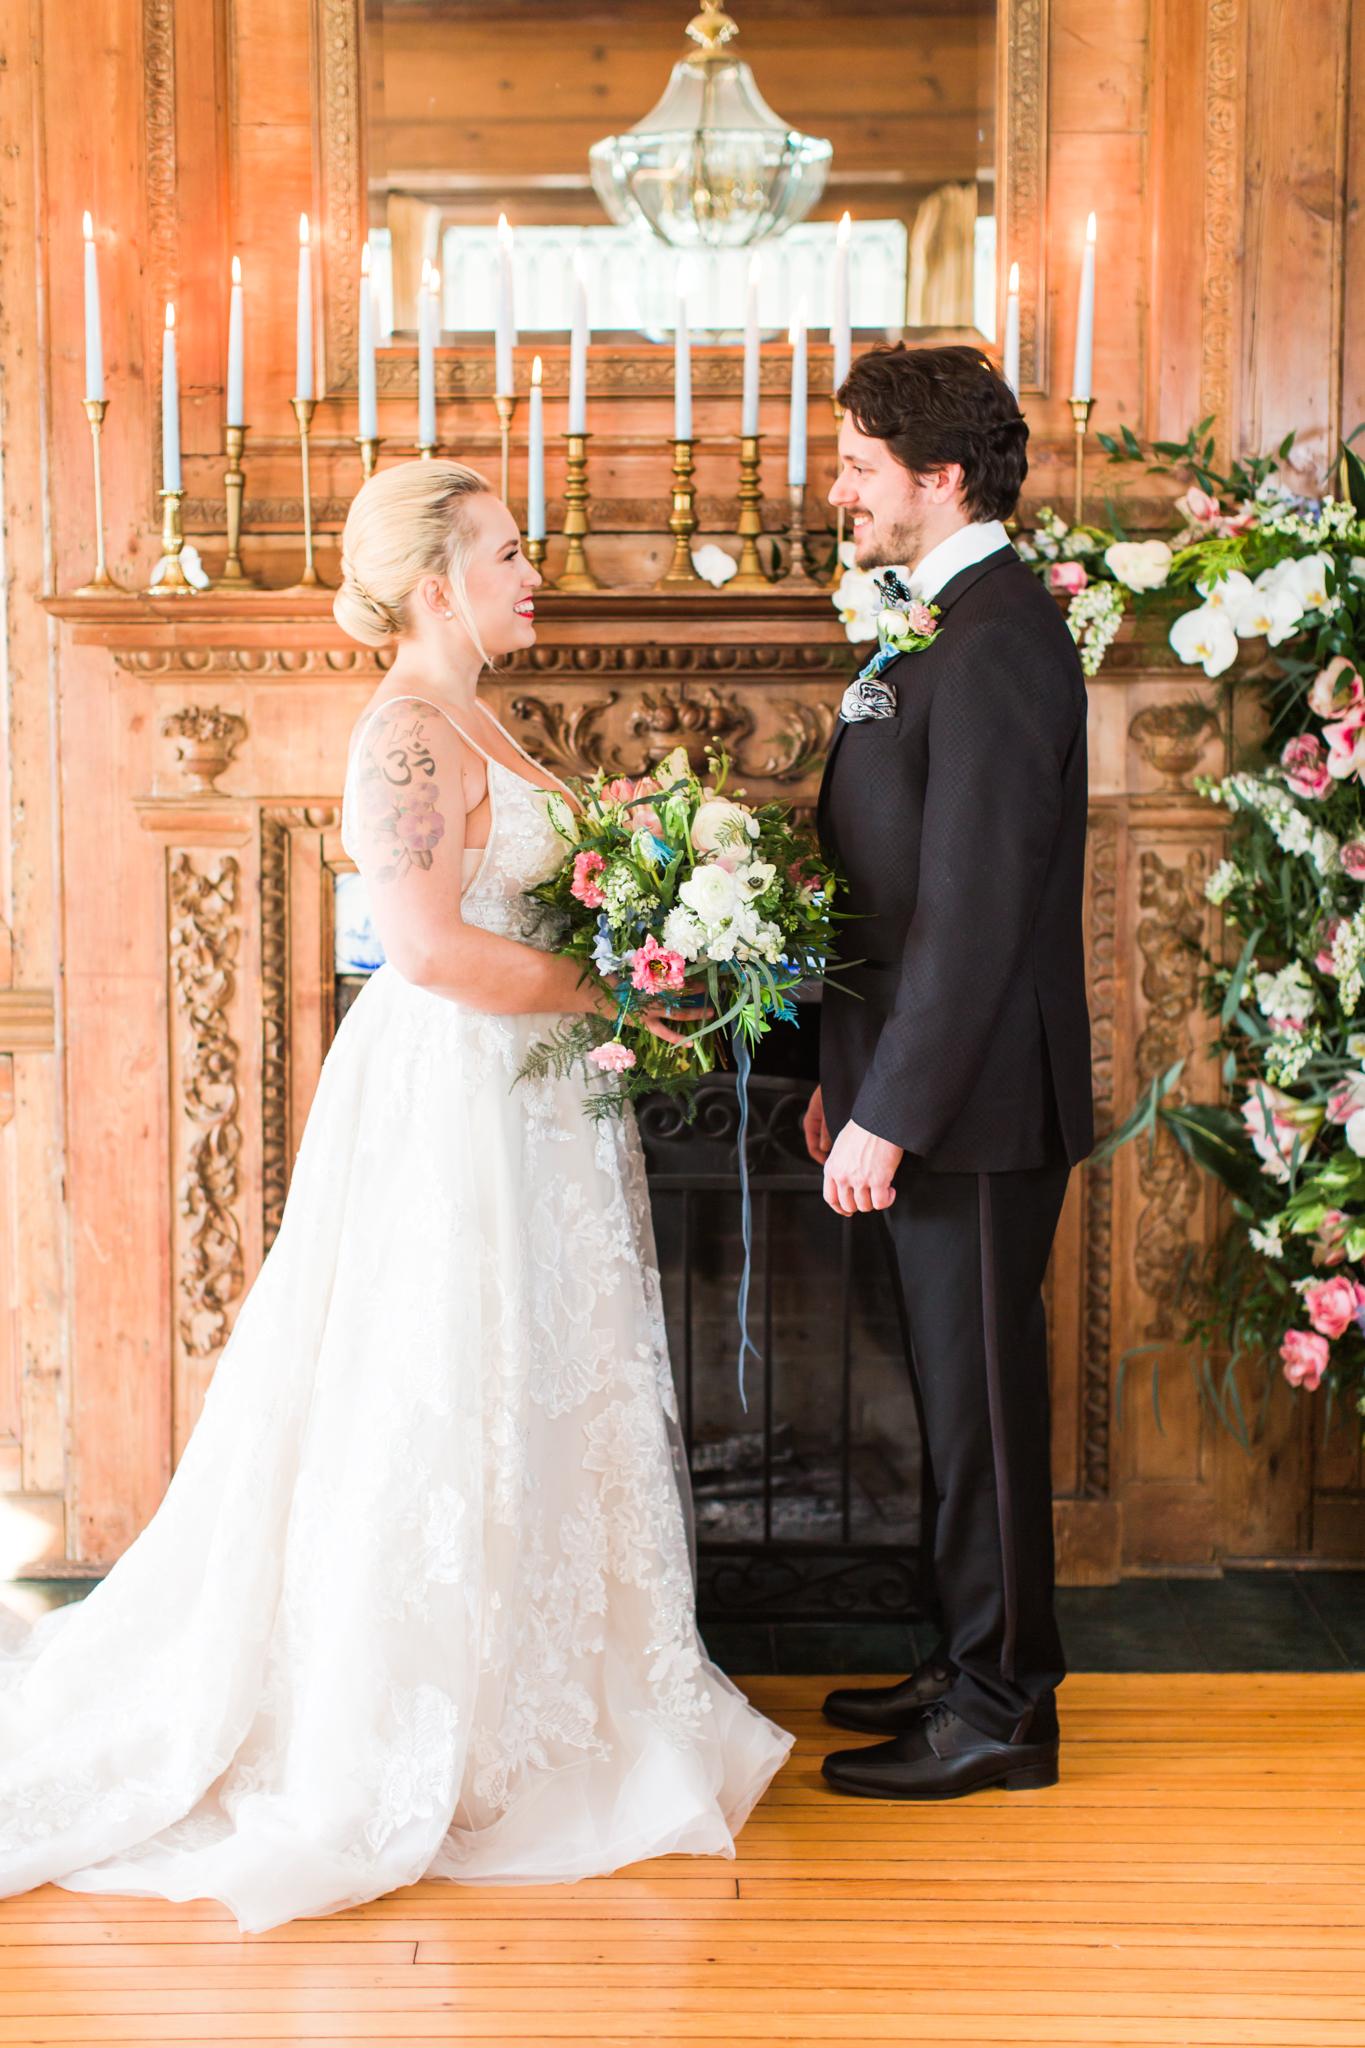 Haley Mansion Winter Wedding - Shaina Lee Photography-190.jpg